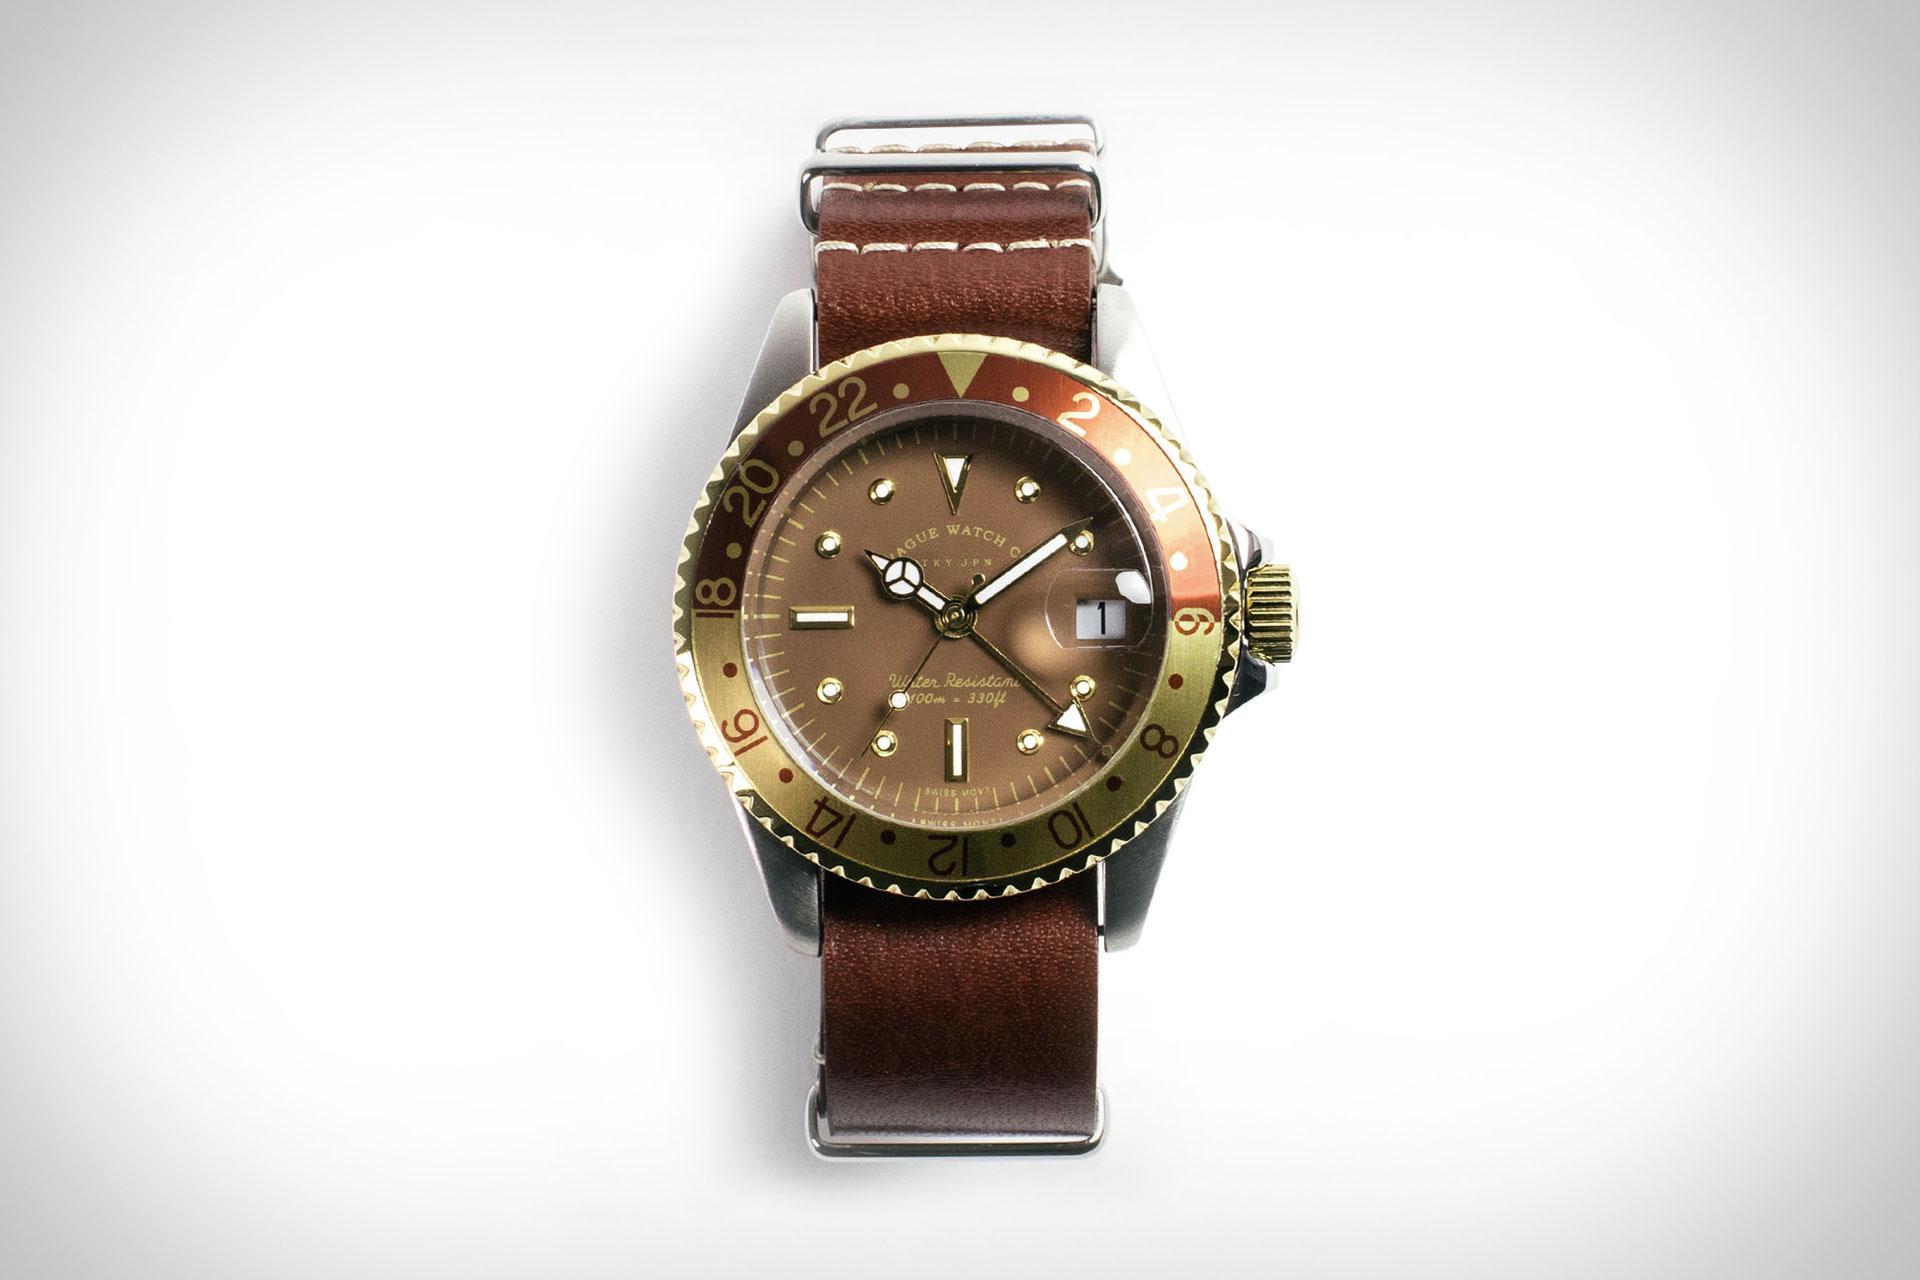 Vague GMT Watch